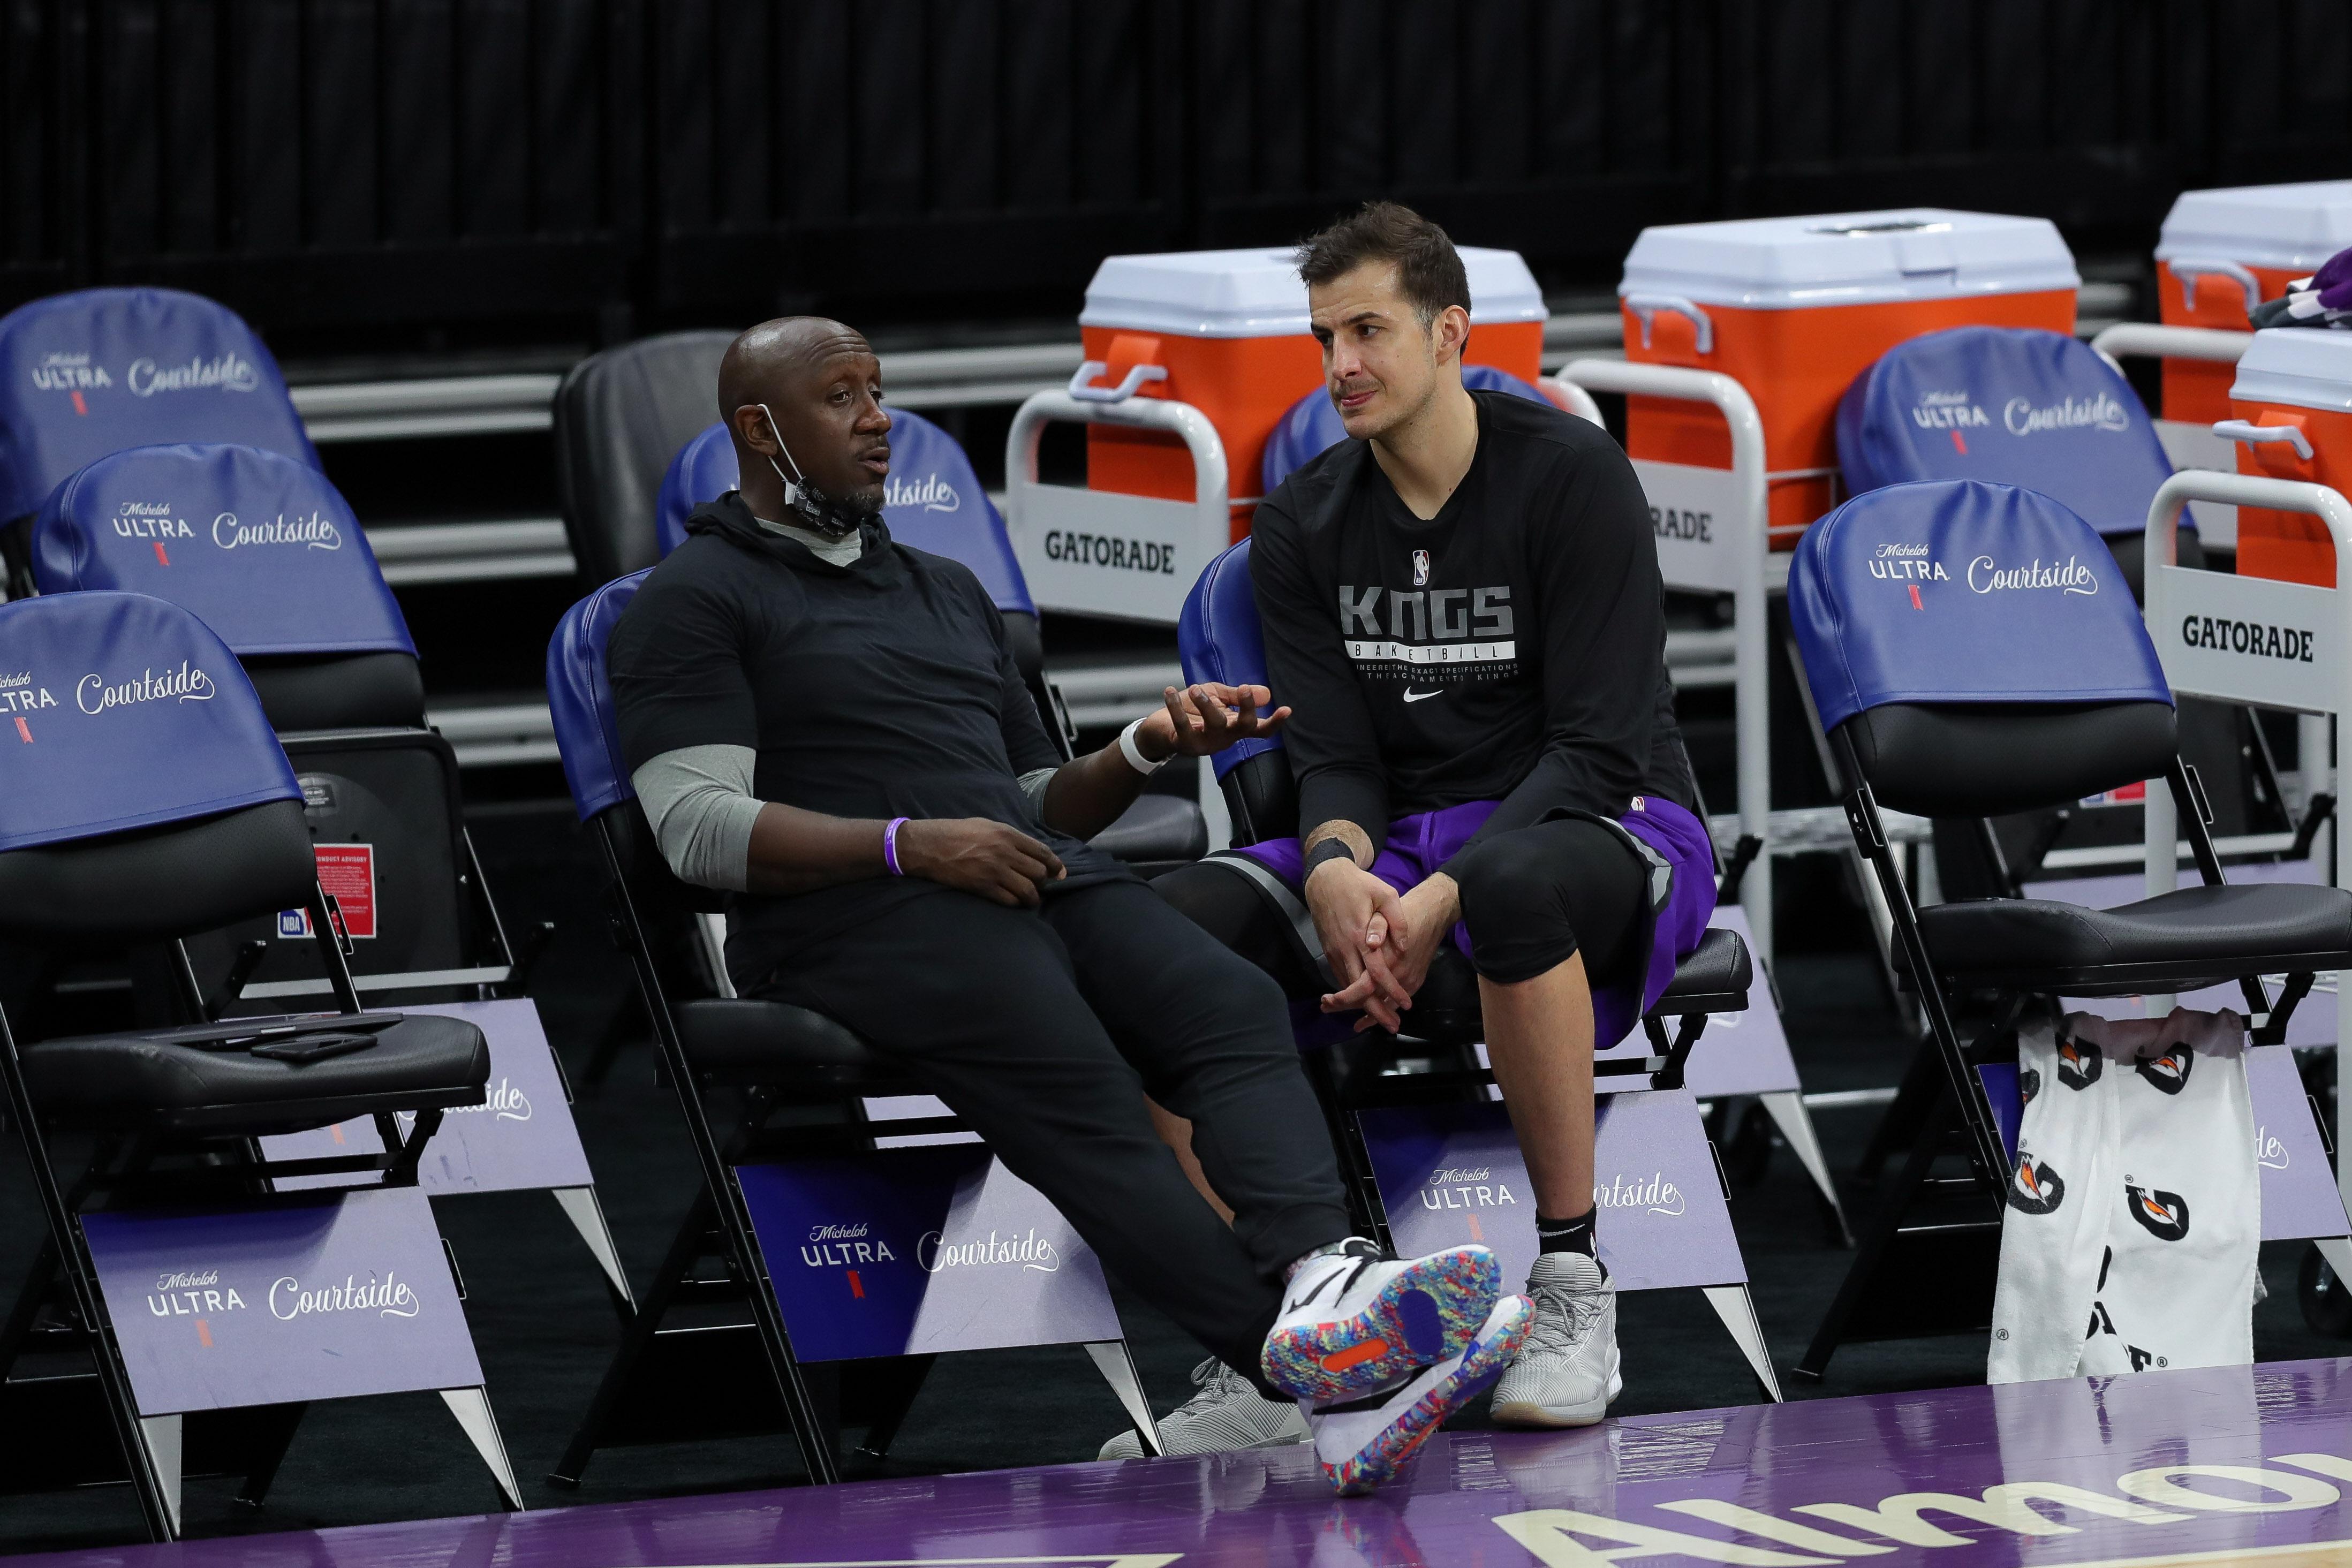 Jan 8, 2021; Sacramento, California, USA; Sacramento Kings assistant coach Bobby Jackson talks with forward Nemanja Bjelica (8) before the game against the Toronto Raptors at Golden 1 Center.